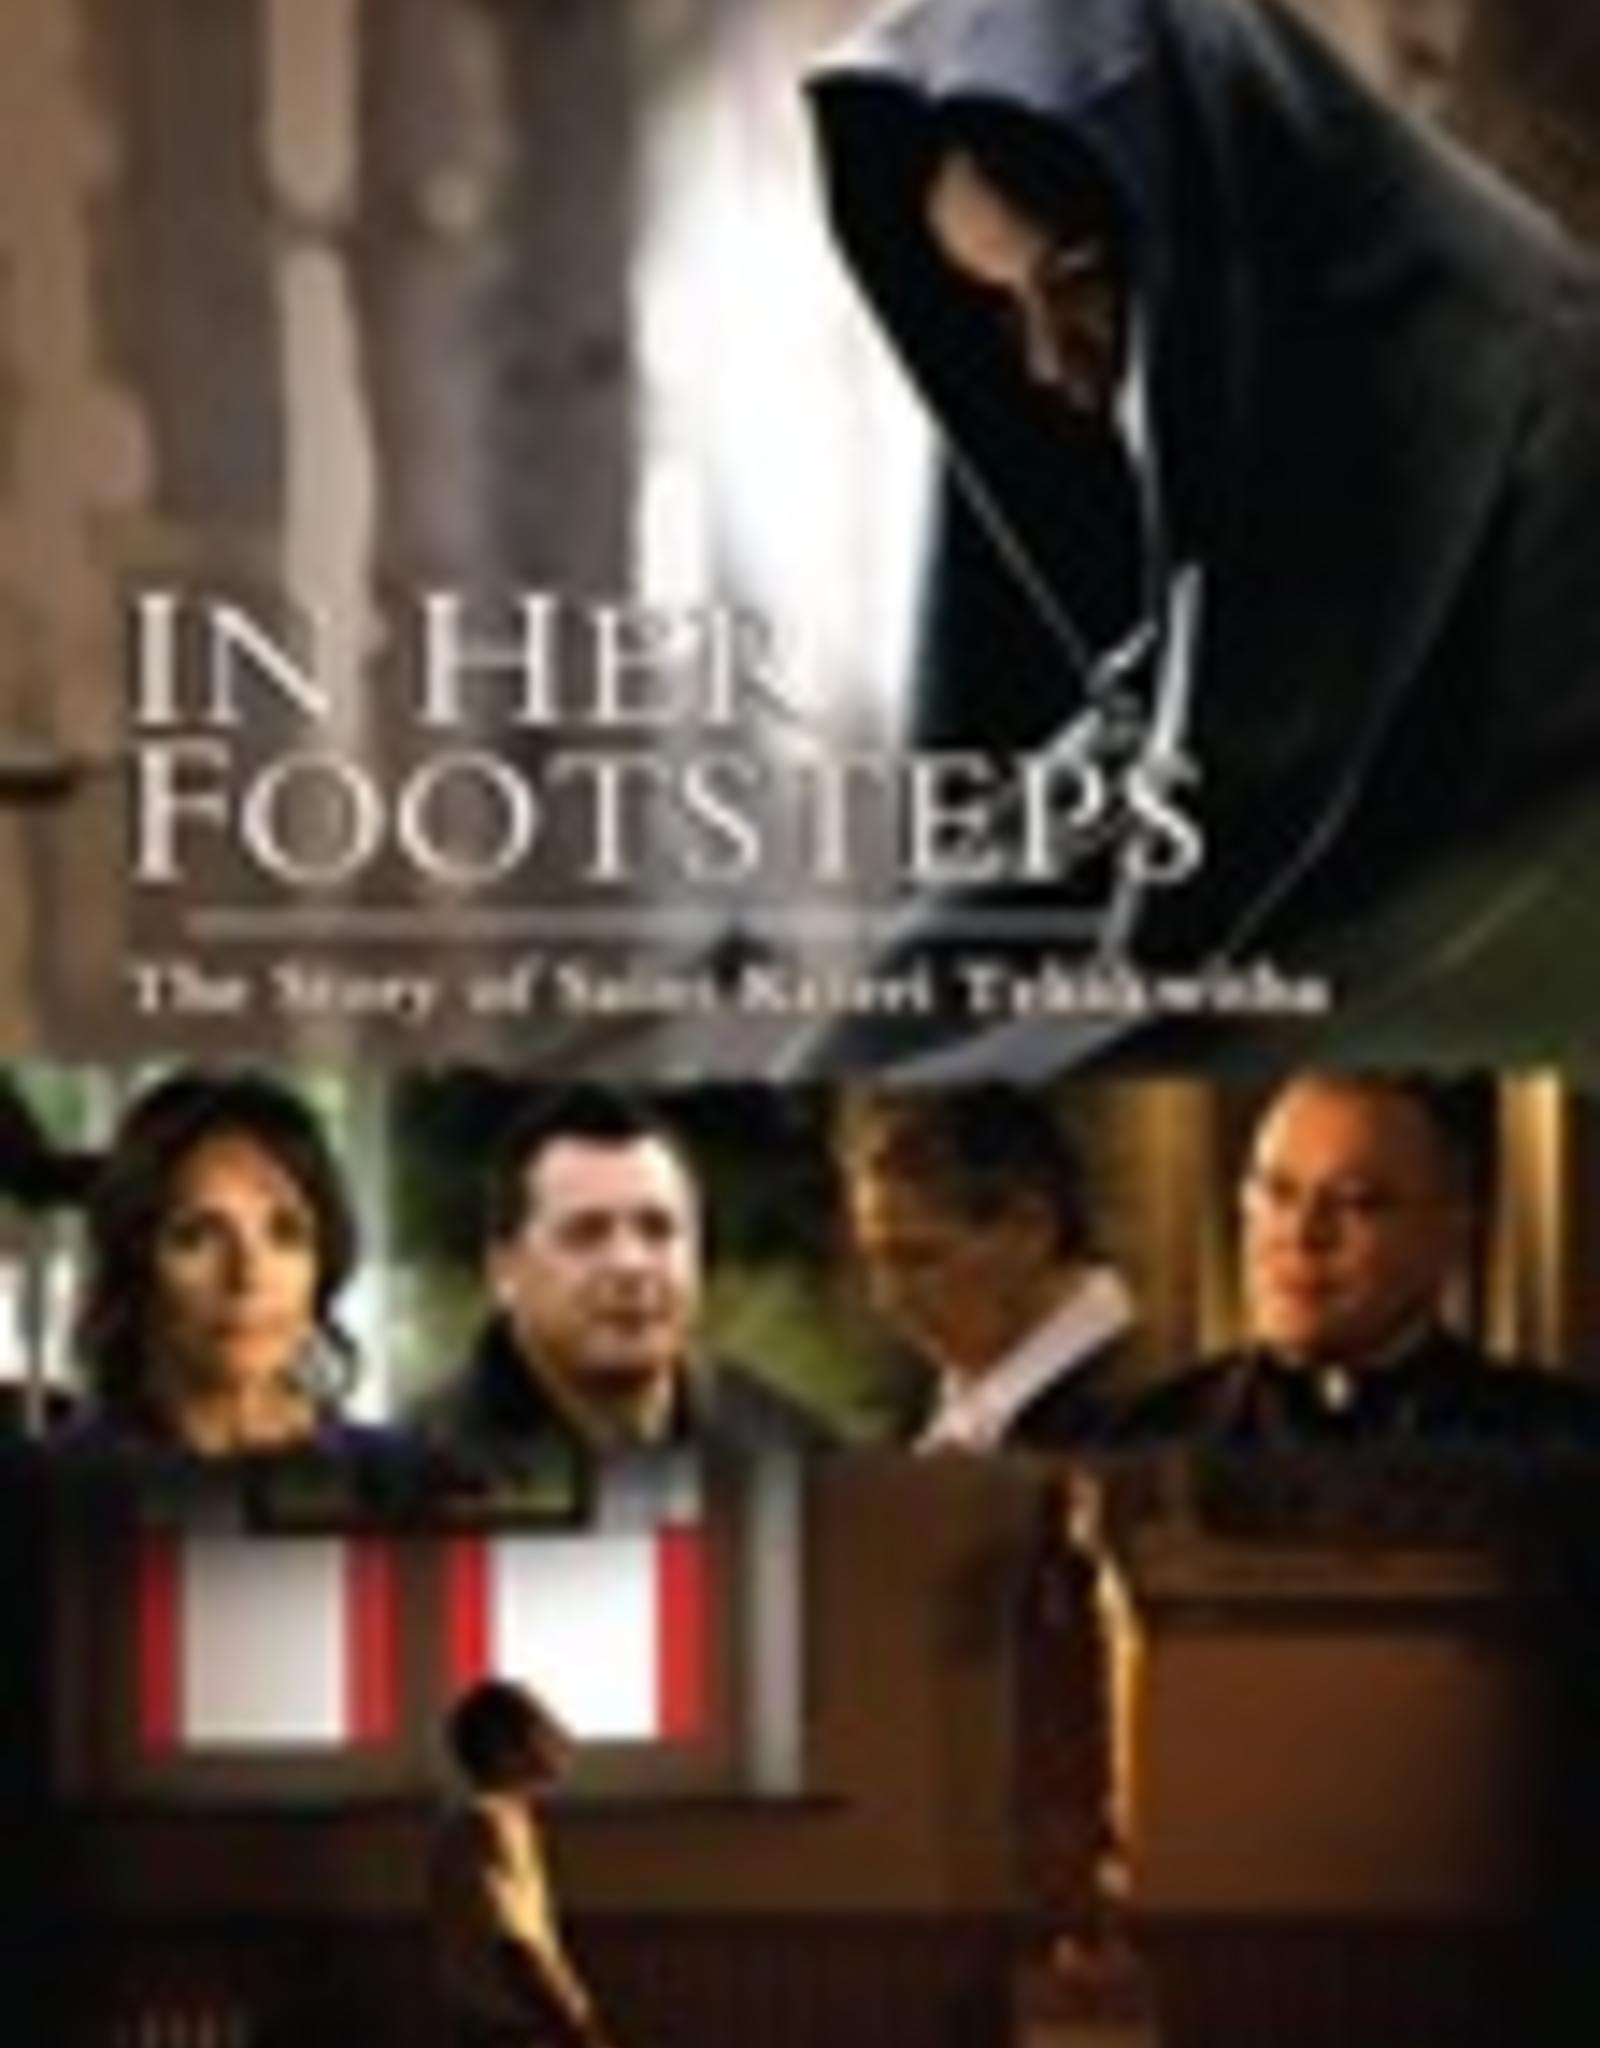 Ignatius Press In Her Footsteps:  The Story of Saint Kateri Tekakwitha (DVD)